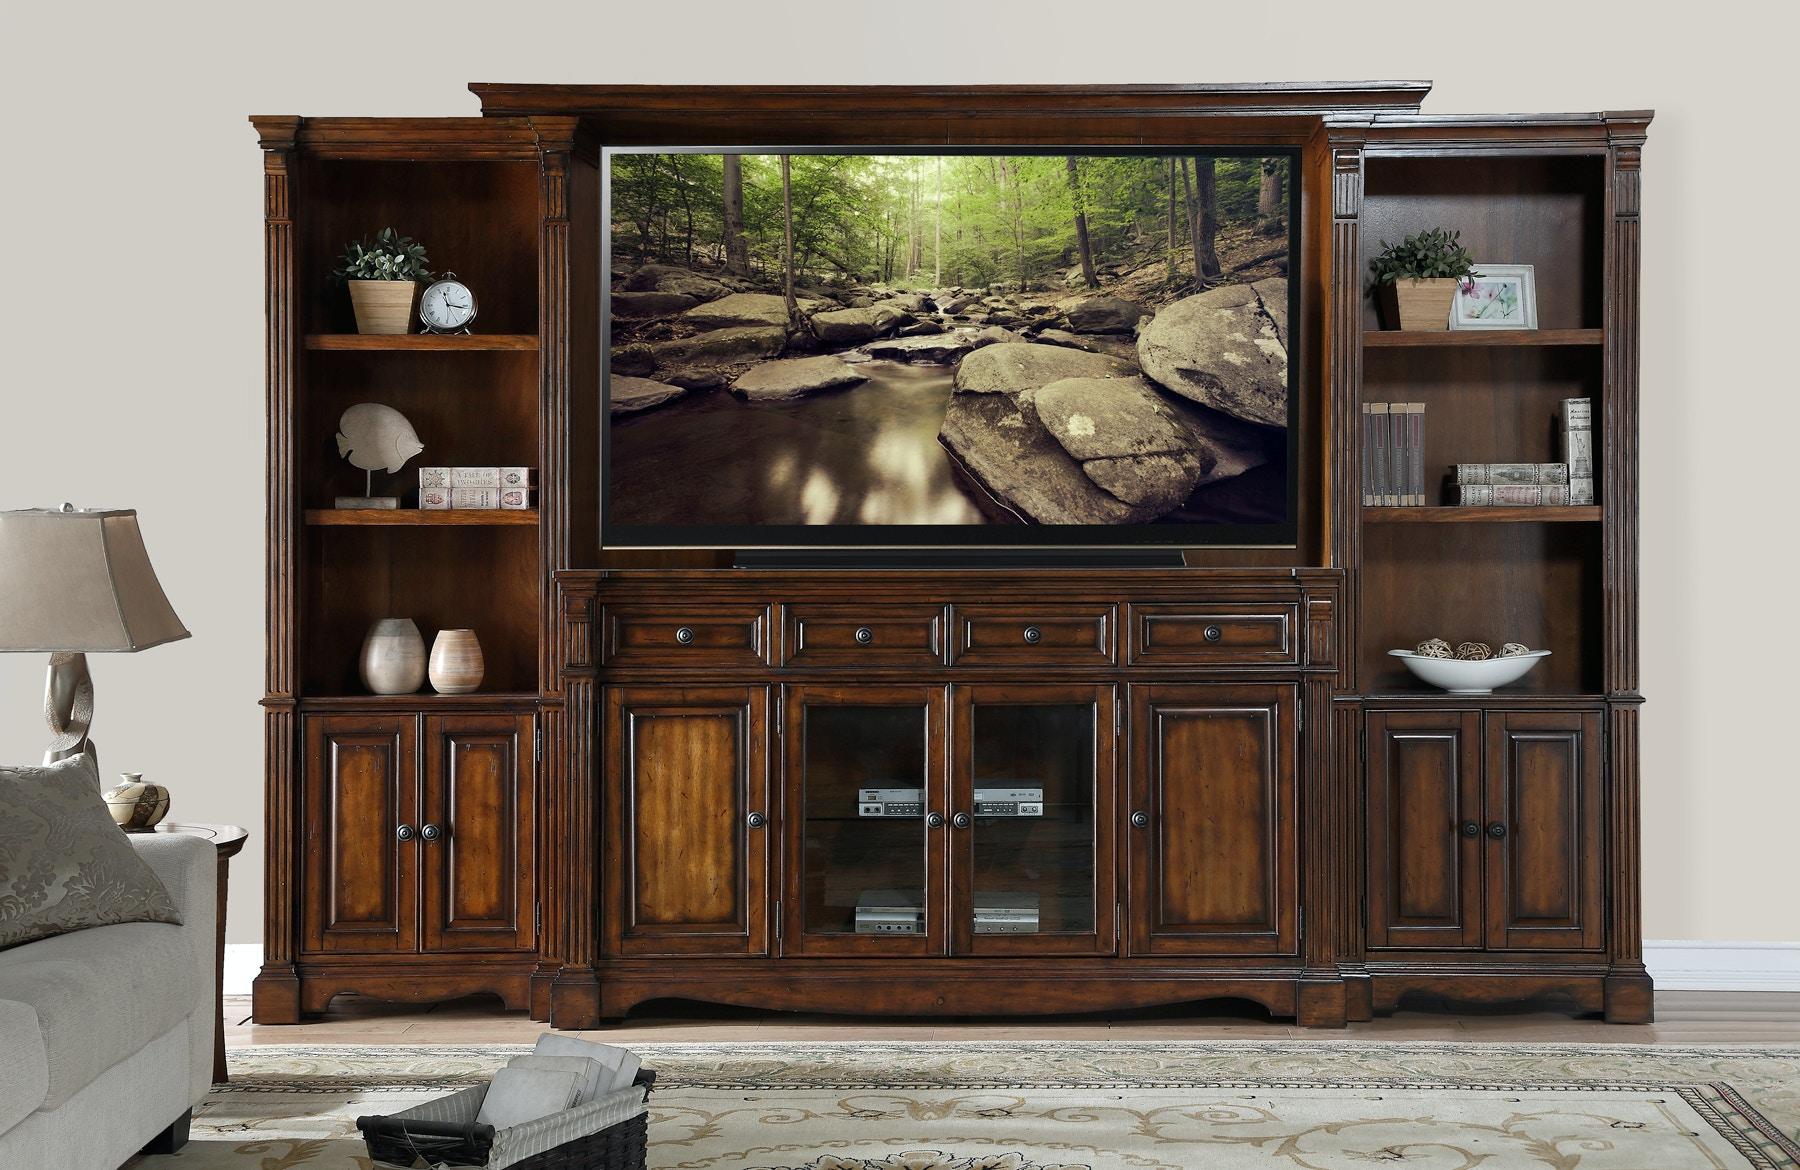 Living Room Sets Okc beautiful living room furniture okc texas apr 21 2017 e and